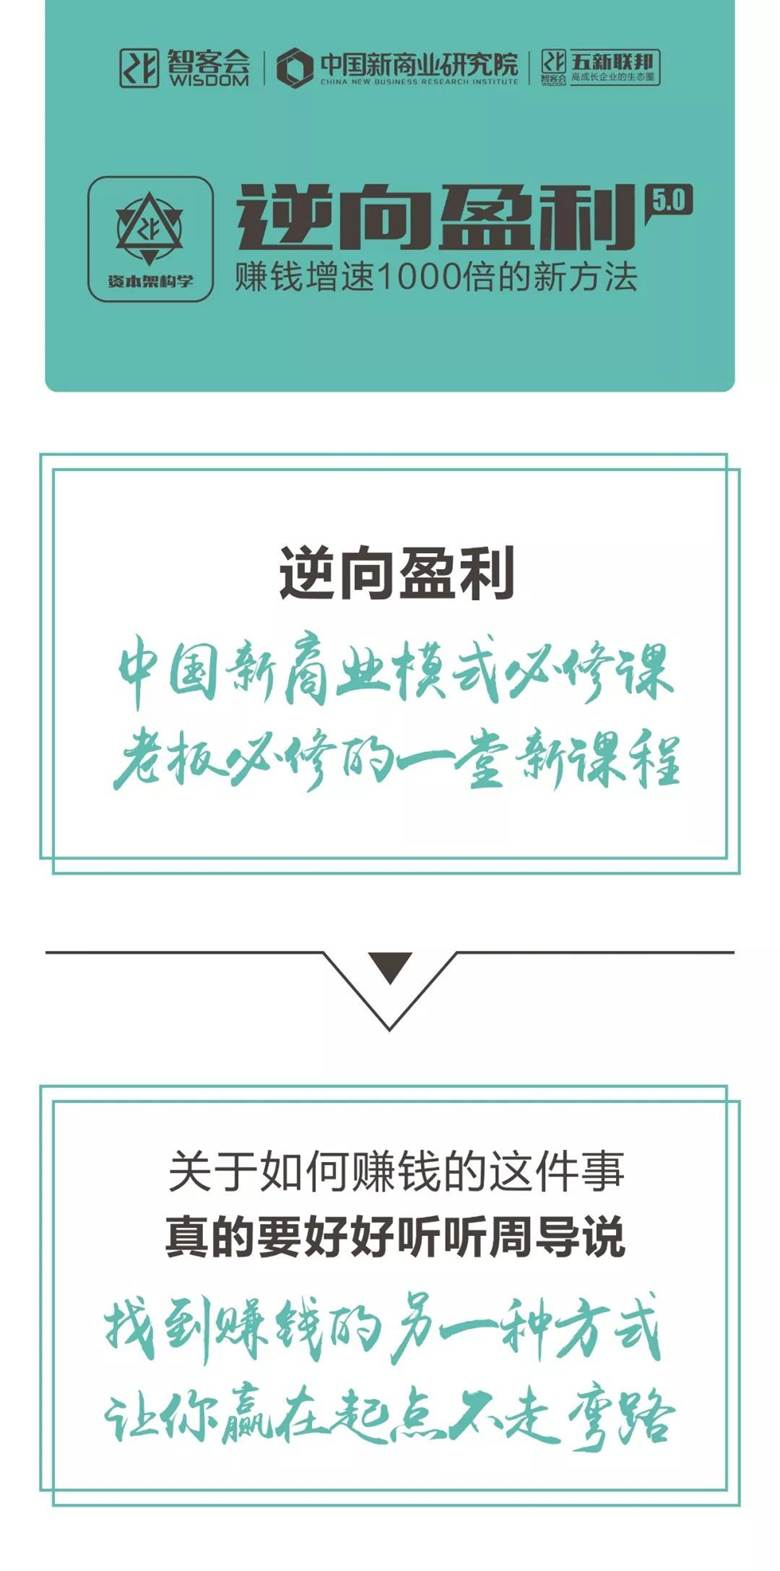 http://www.huodongxing.com/file/20191113/1063603644976/443659461373208.jpeg